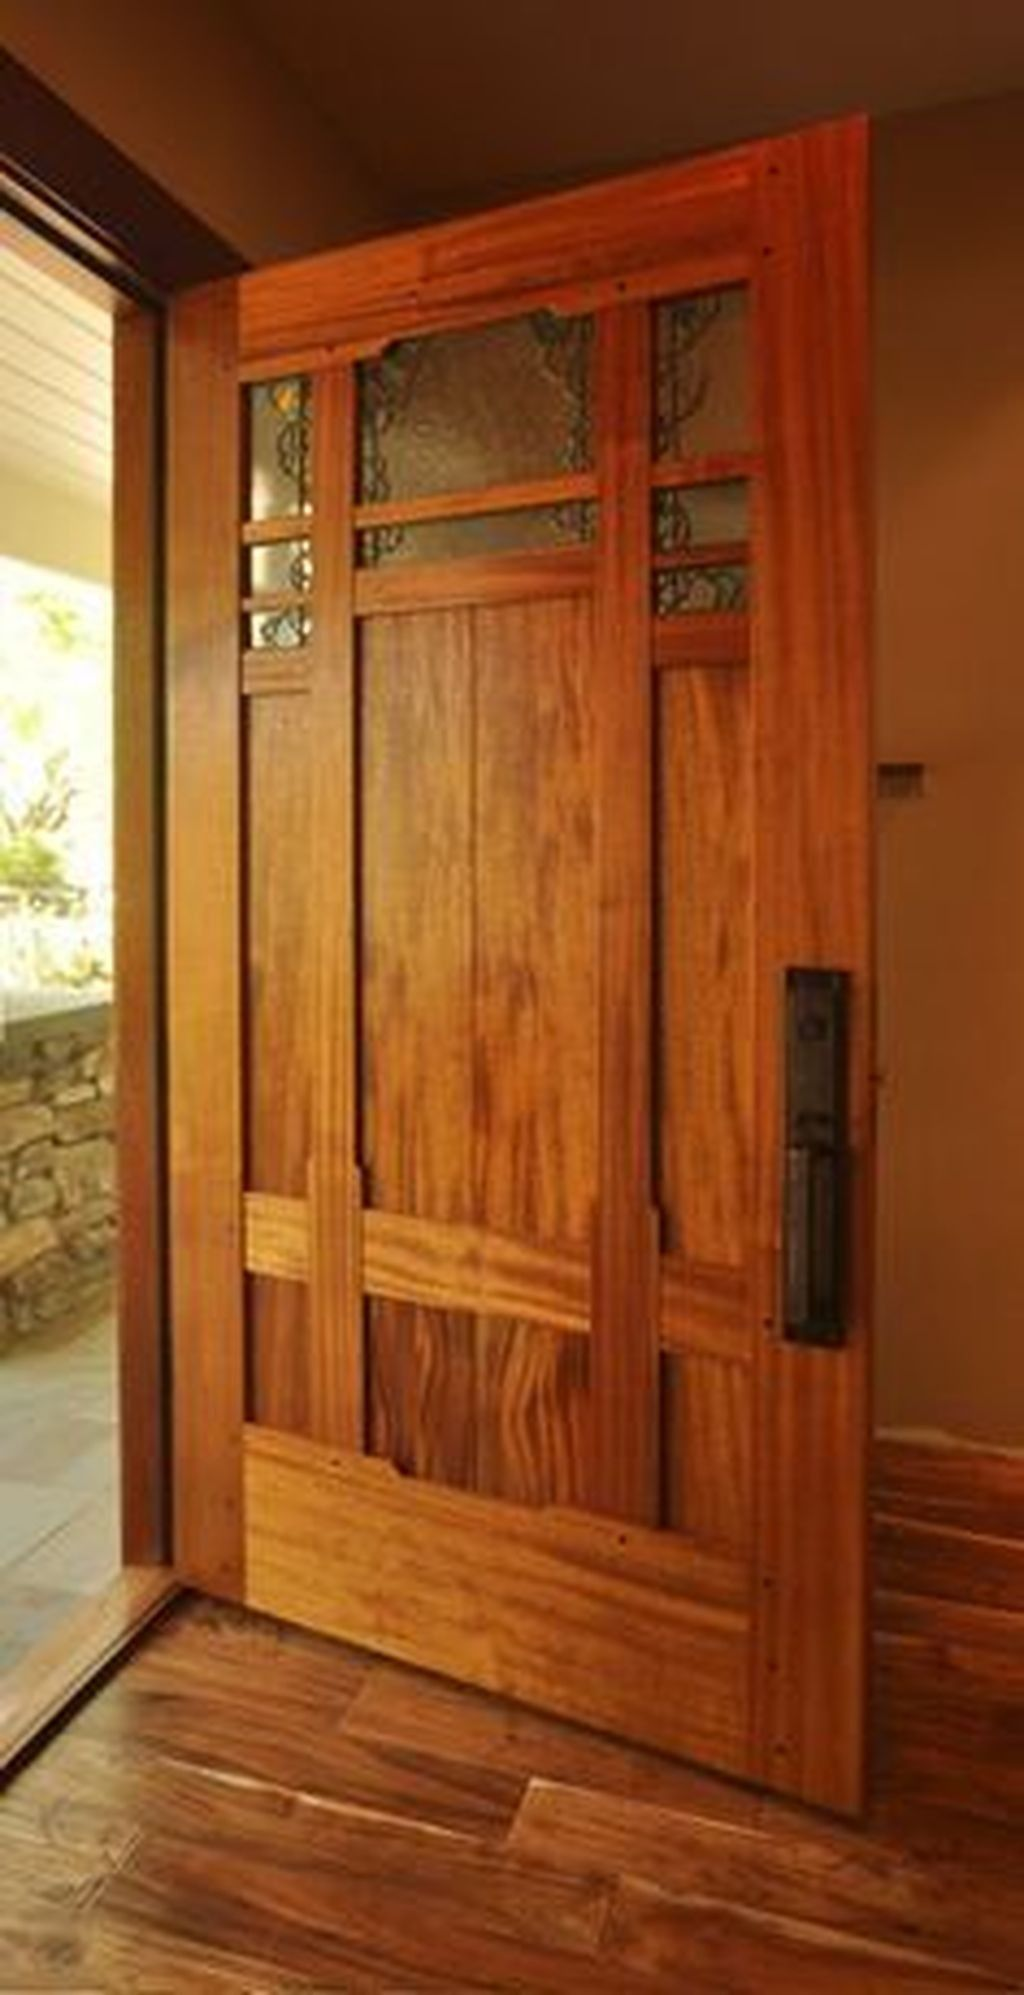 40+ Nice Exterior Door Ideas For Home Looks Amazing #craftsmanstylehomes